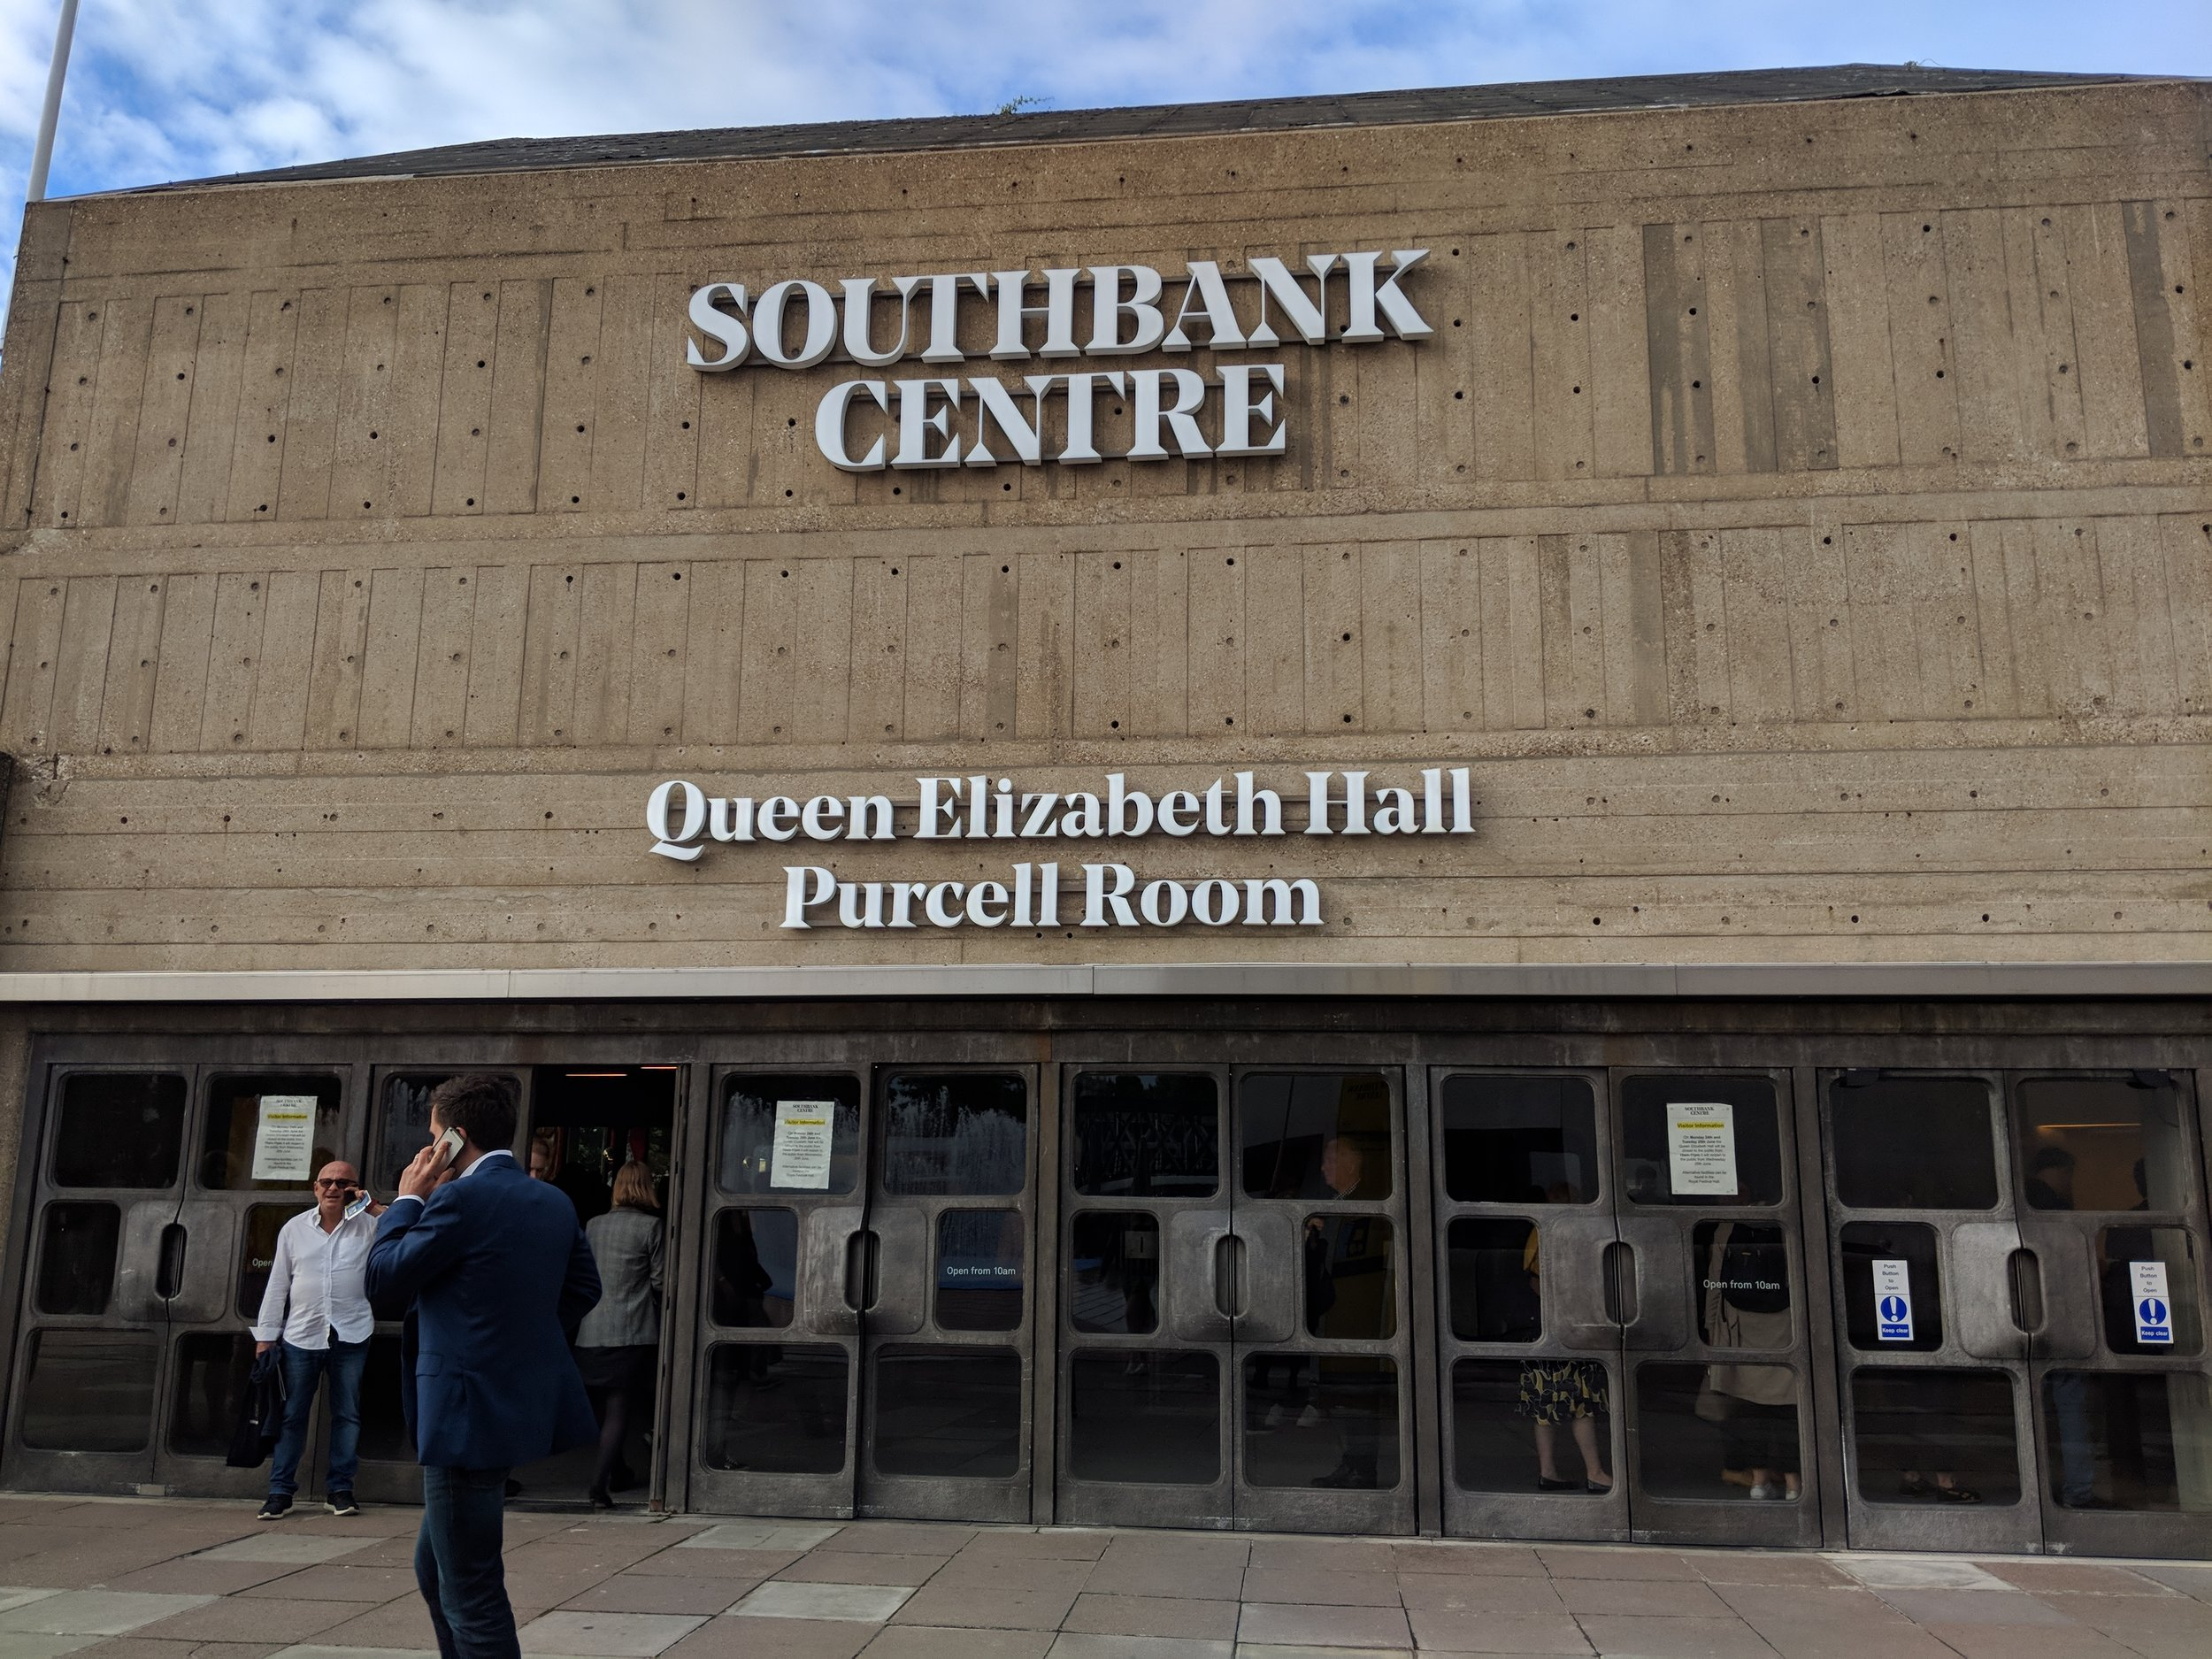 Southbank Centre(Queen Elizabeth Hall) - visited 20/06/2019